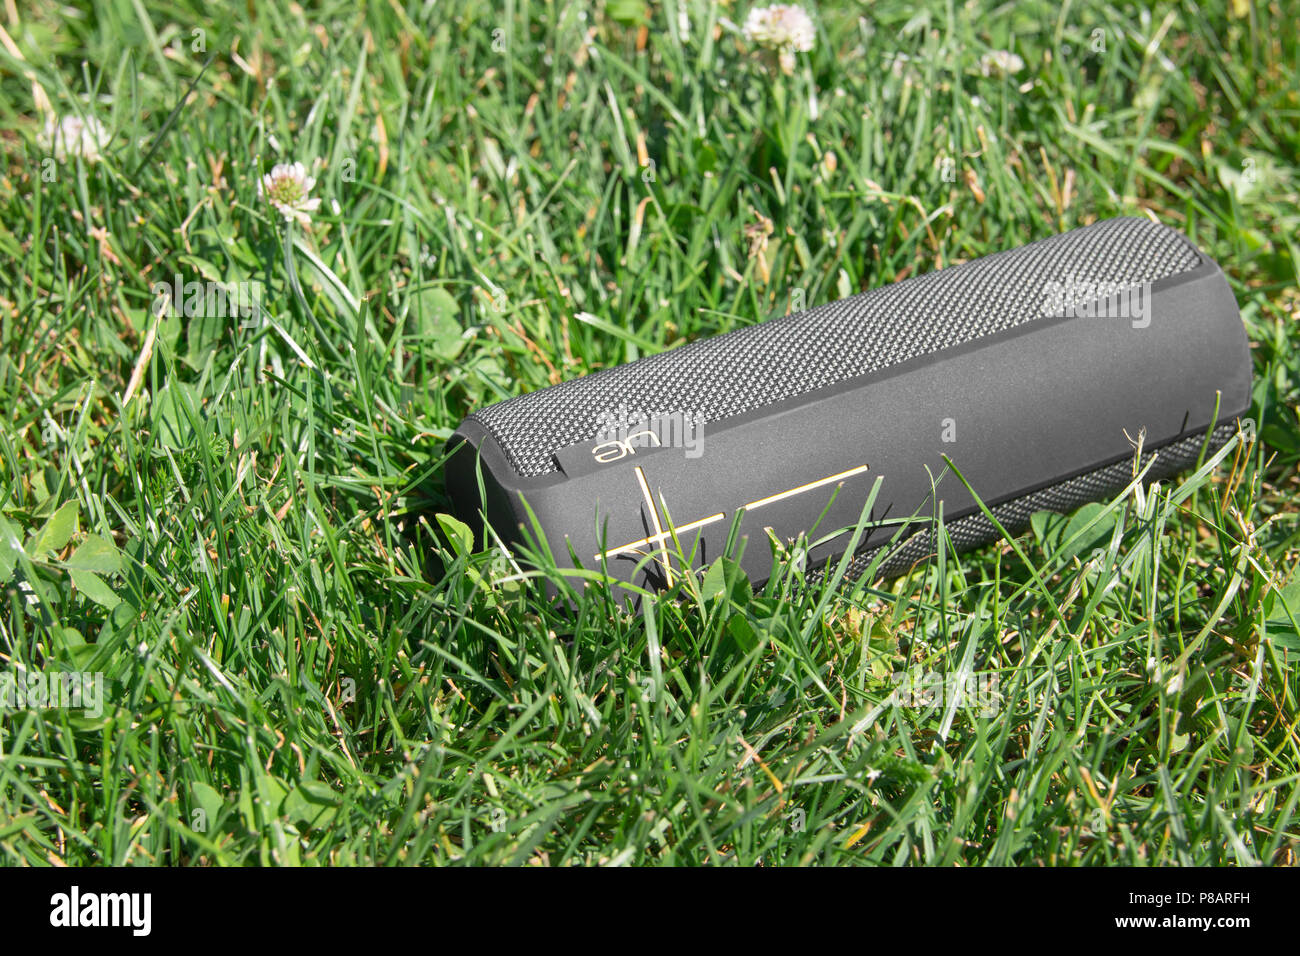 UE Boom audio haut-parleur portable music Photo Stock